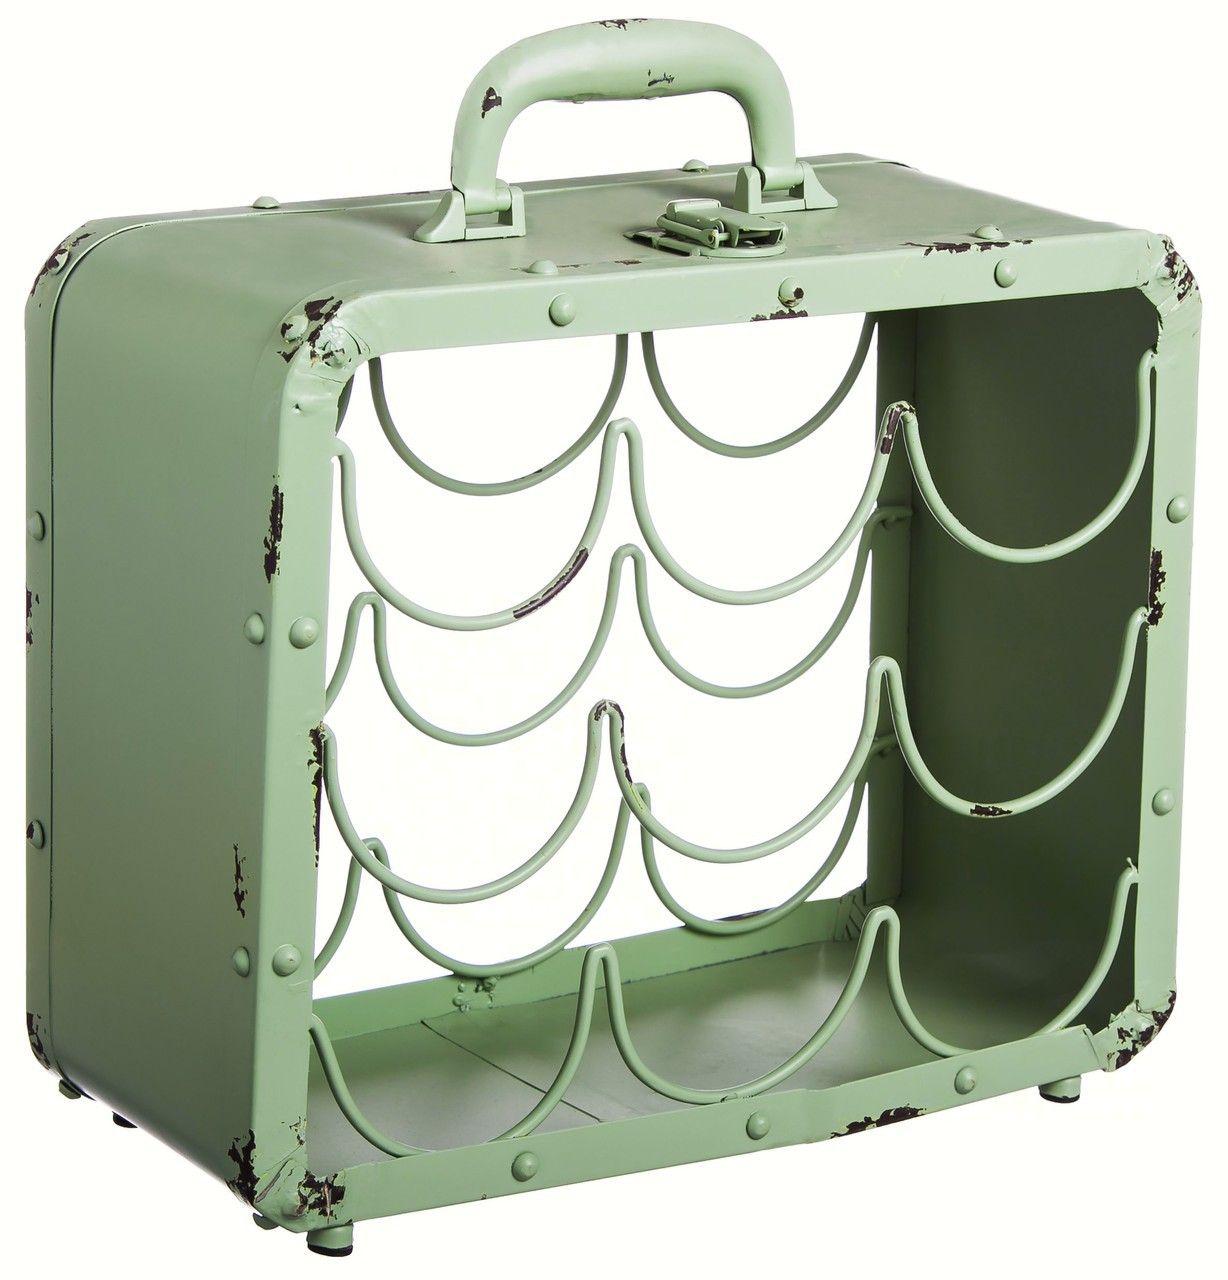 Evergreen Enterprises Antique Green Metal Suitcase Wine Rack EG8WCM004 - CantonWay.com